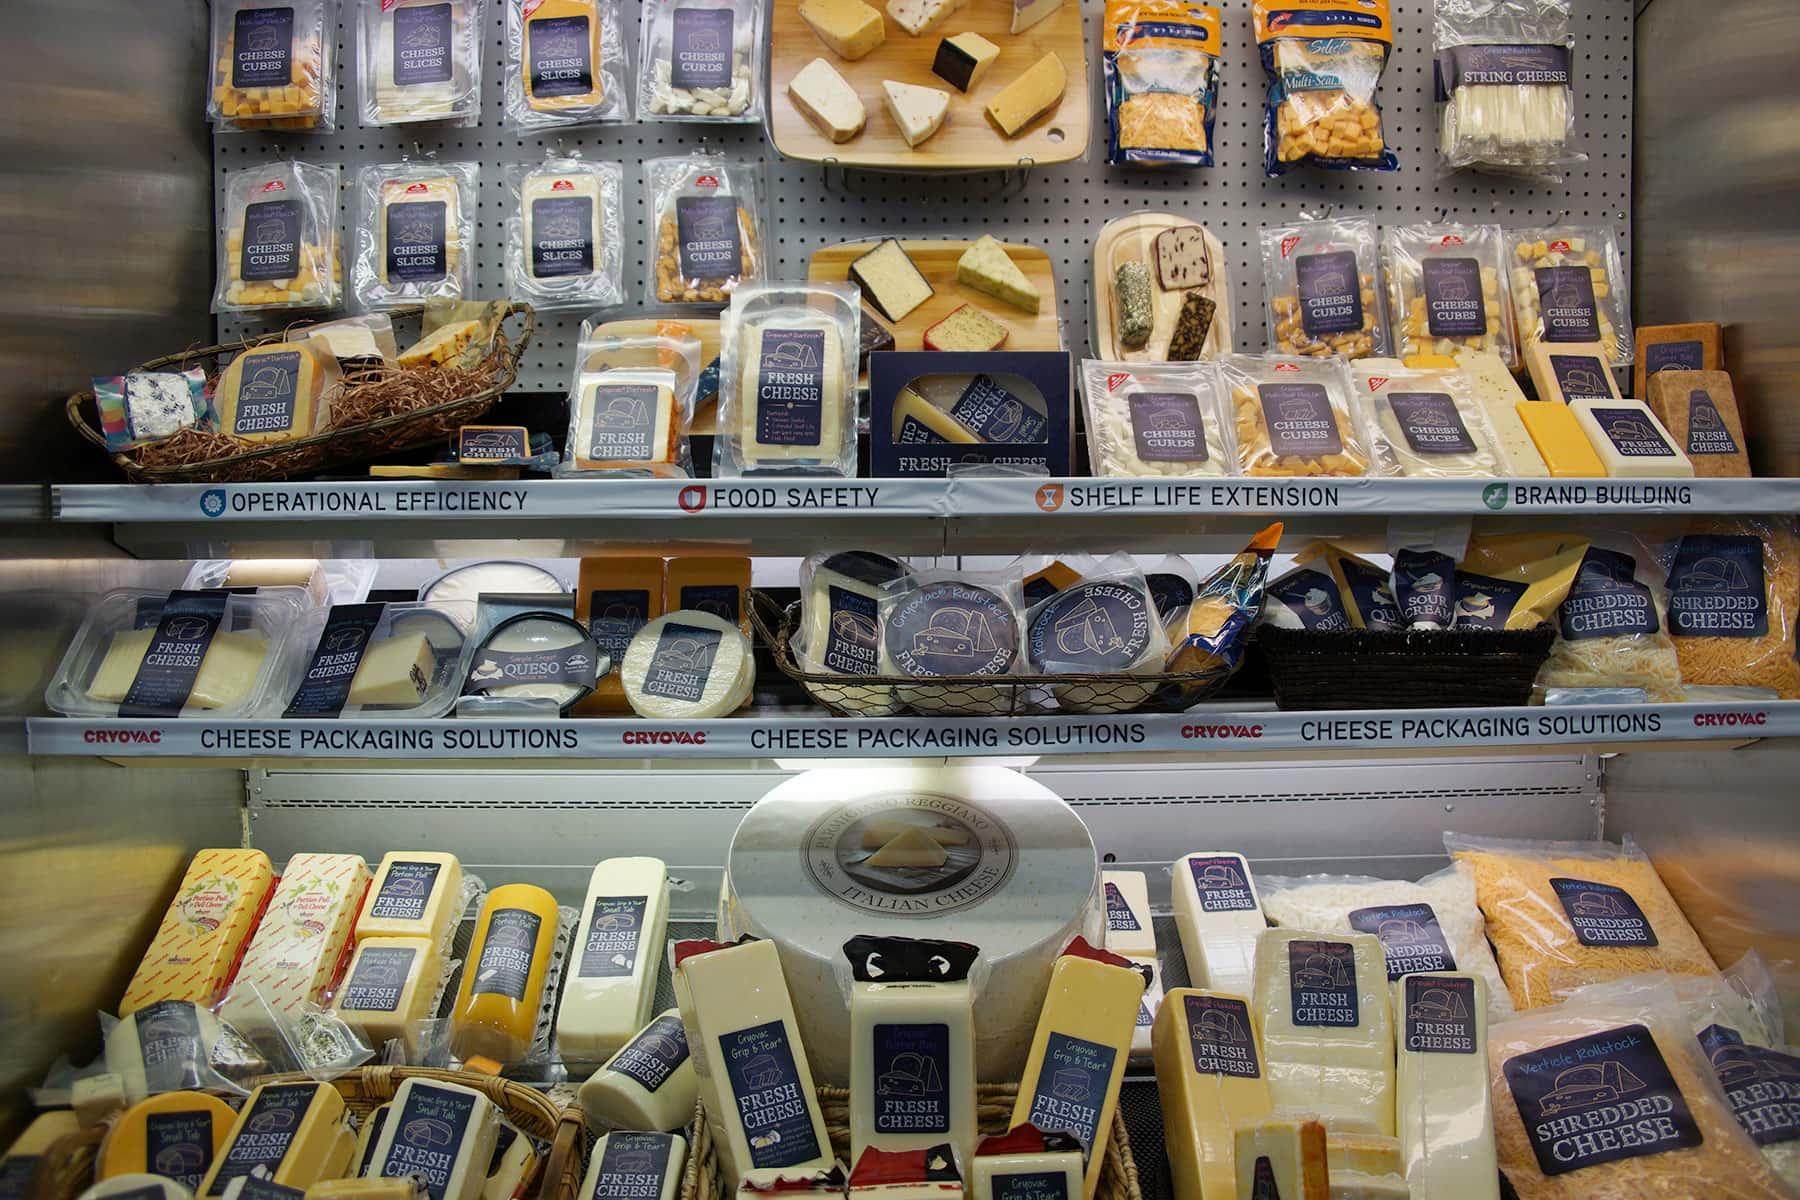 041316_cheesetech_032